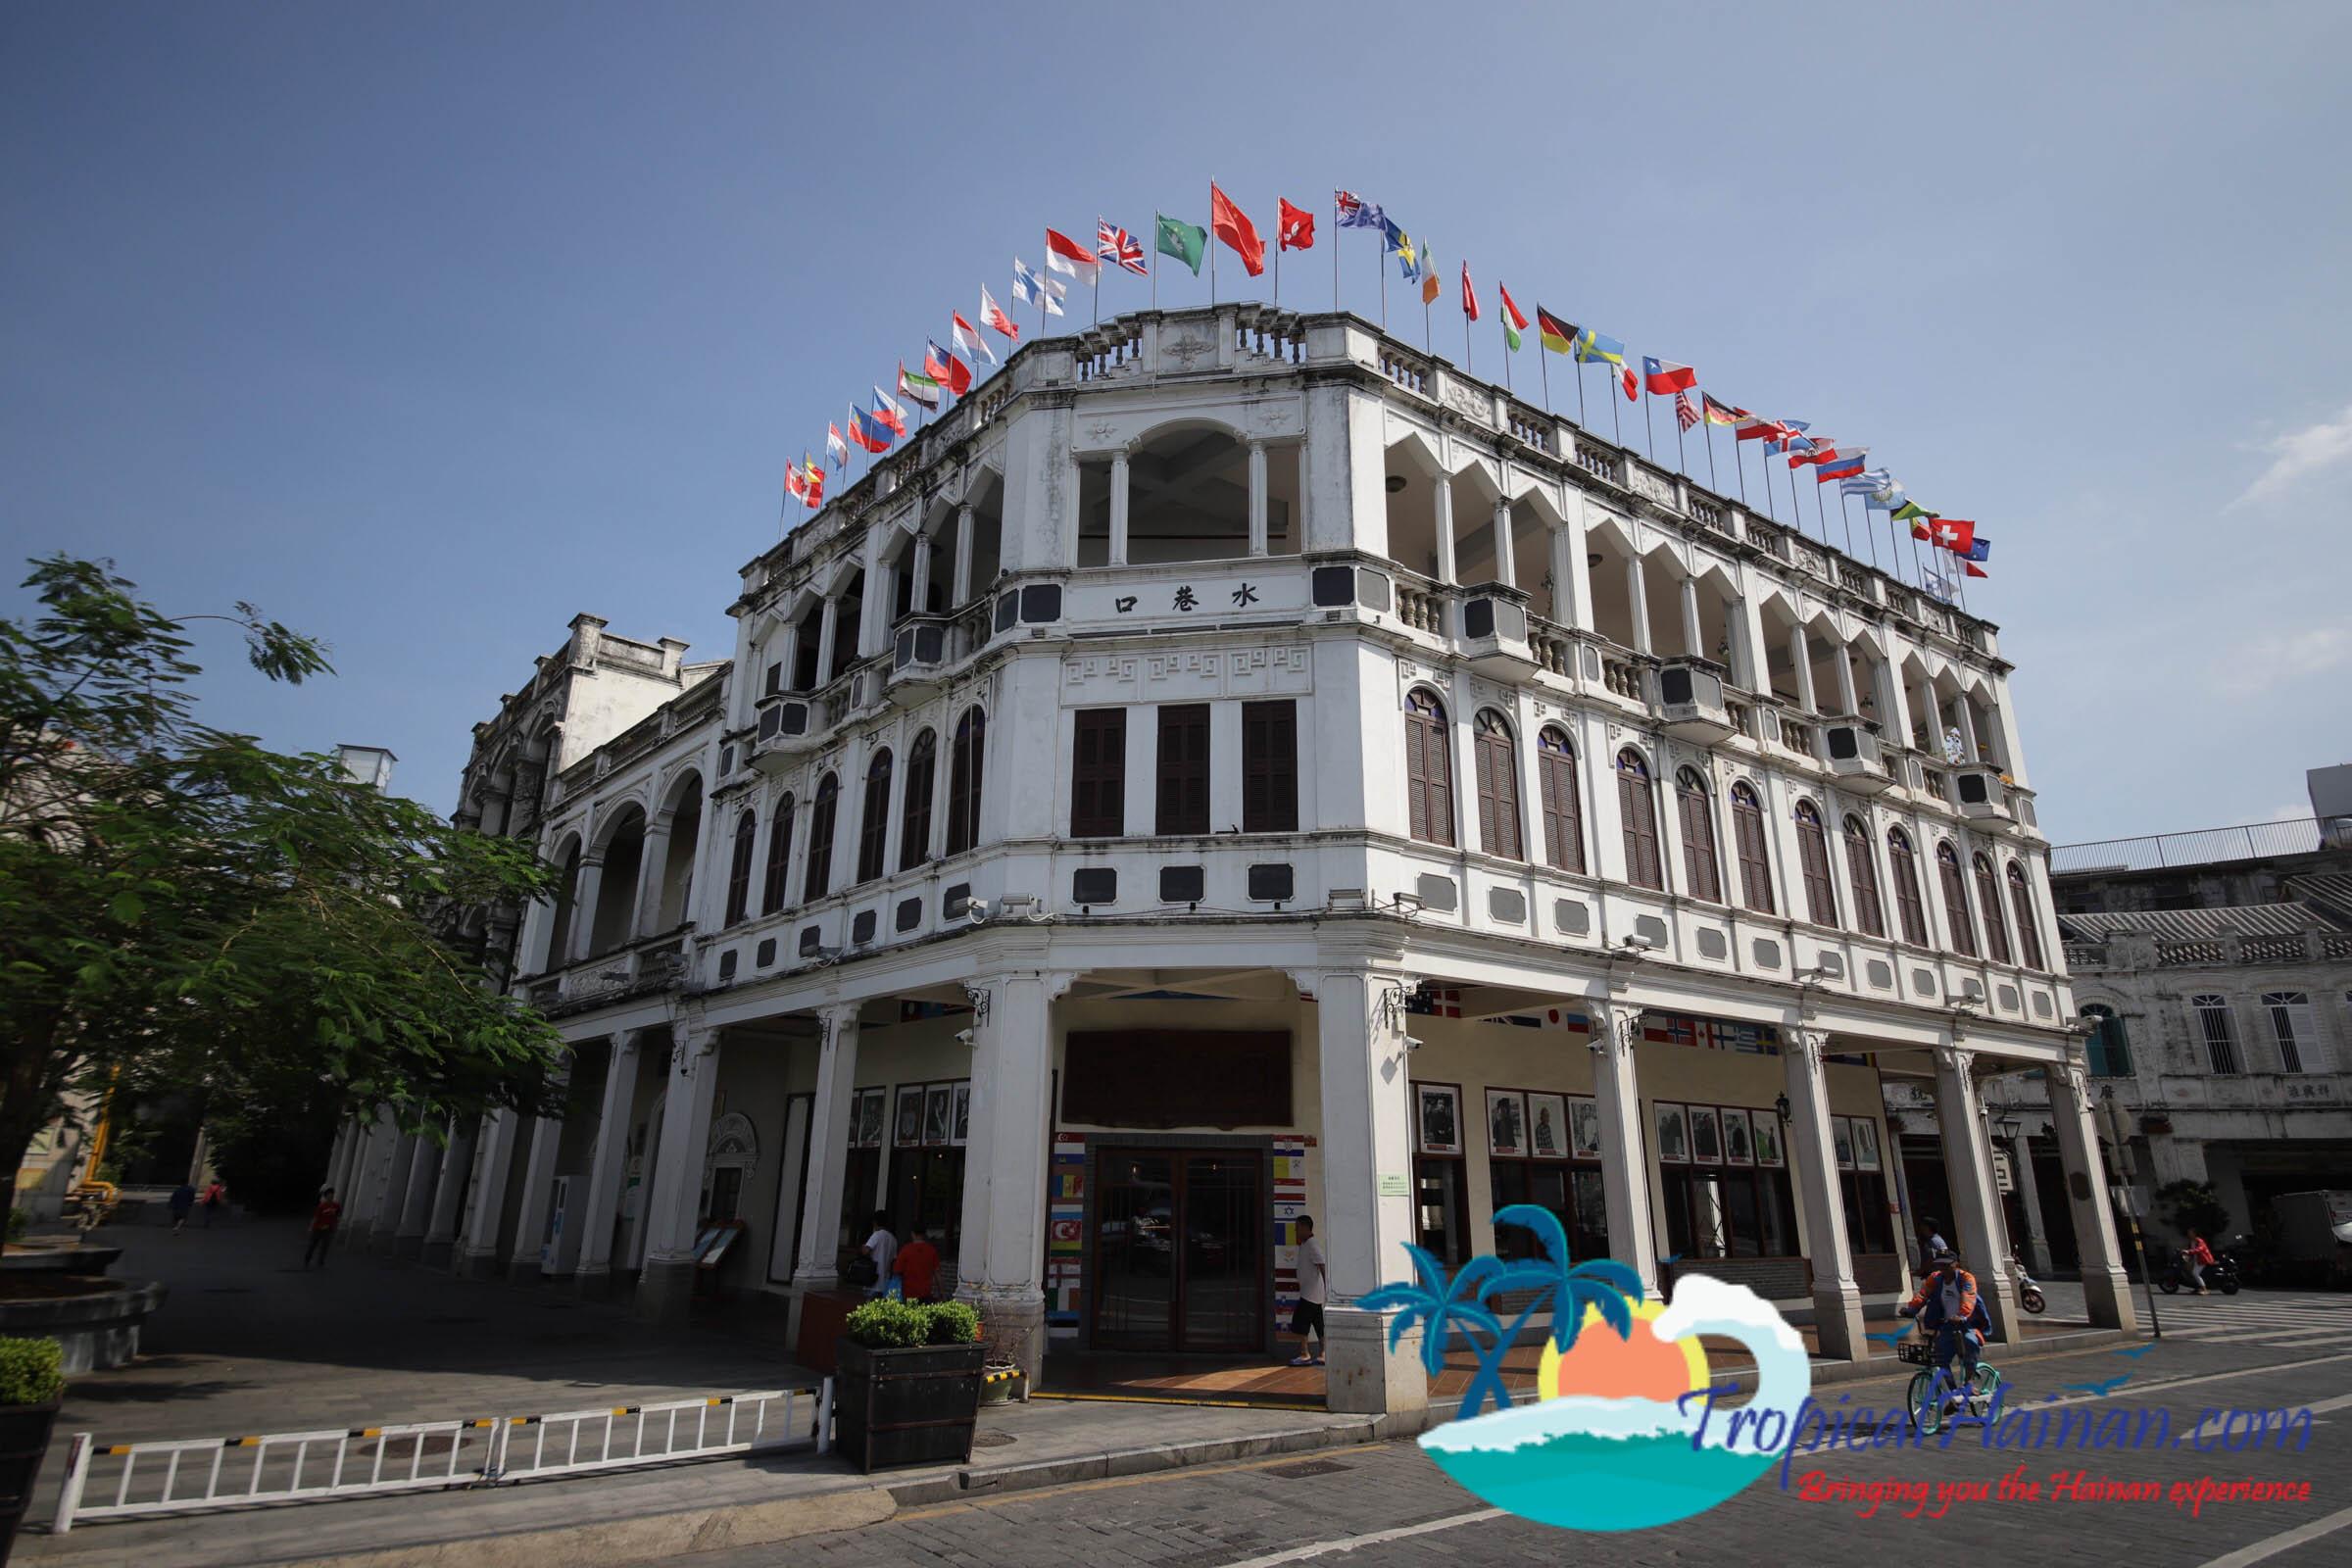 Qilou Coffee shop art gallery and book store Haikou Hainan Island China (1 of 9)